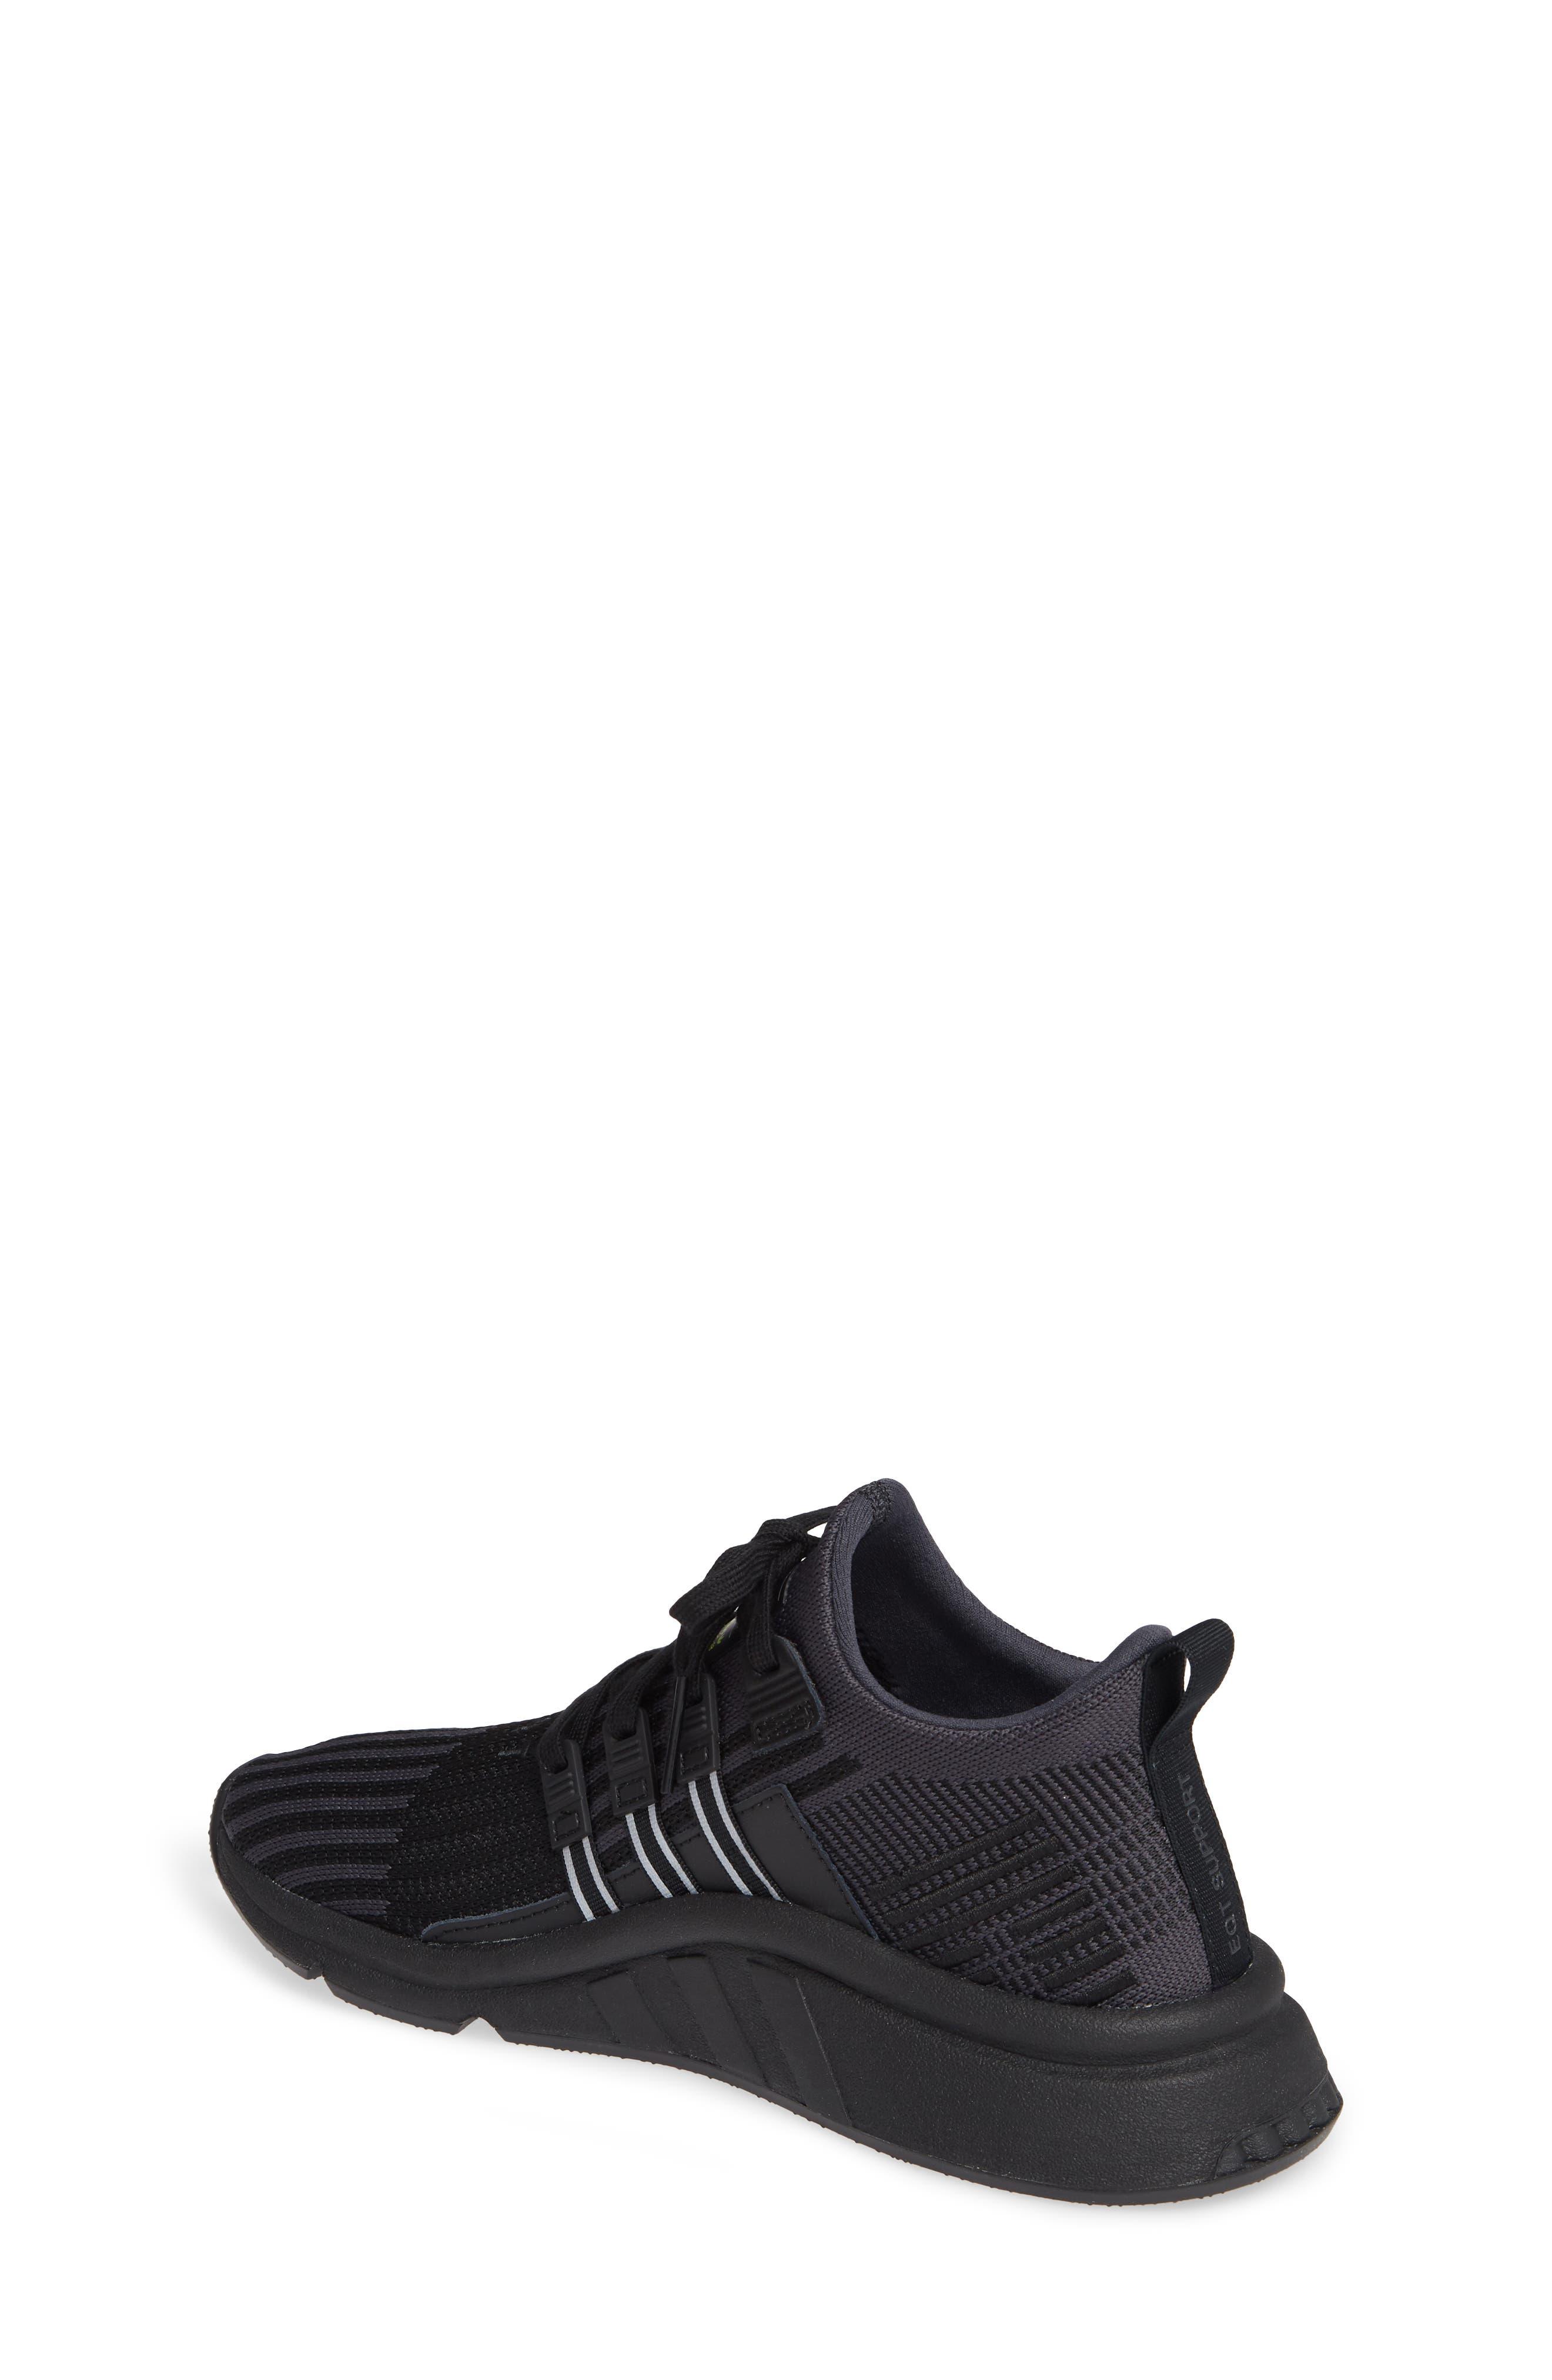 EQT Support Adv Sneaker,                             Alternate thumbnail 2, color,                             001